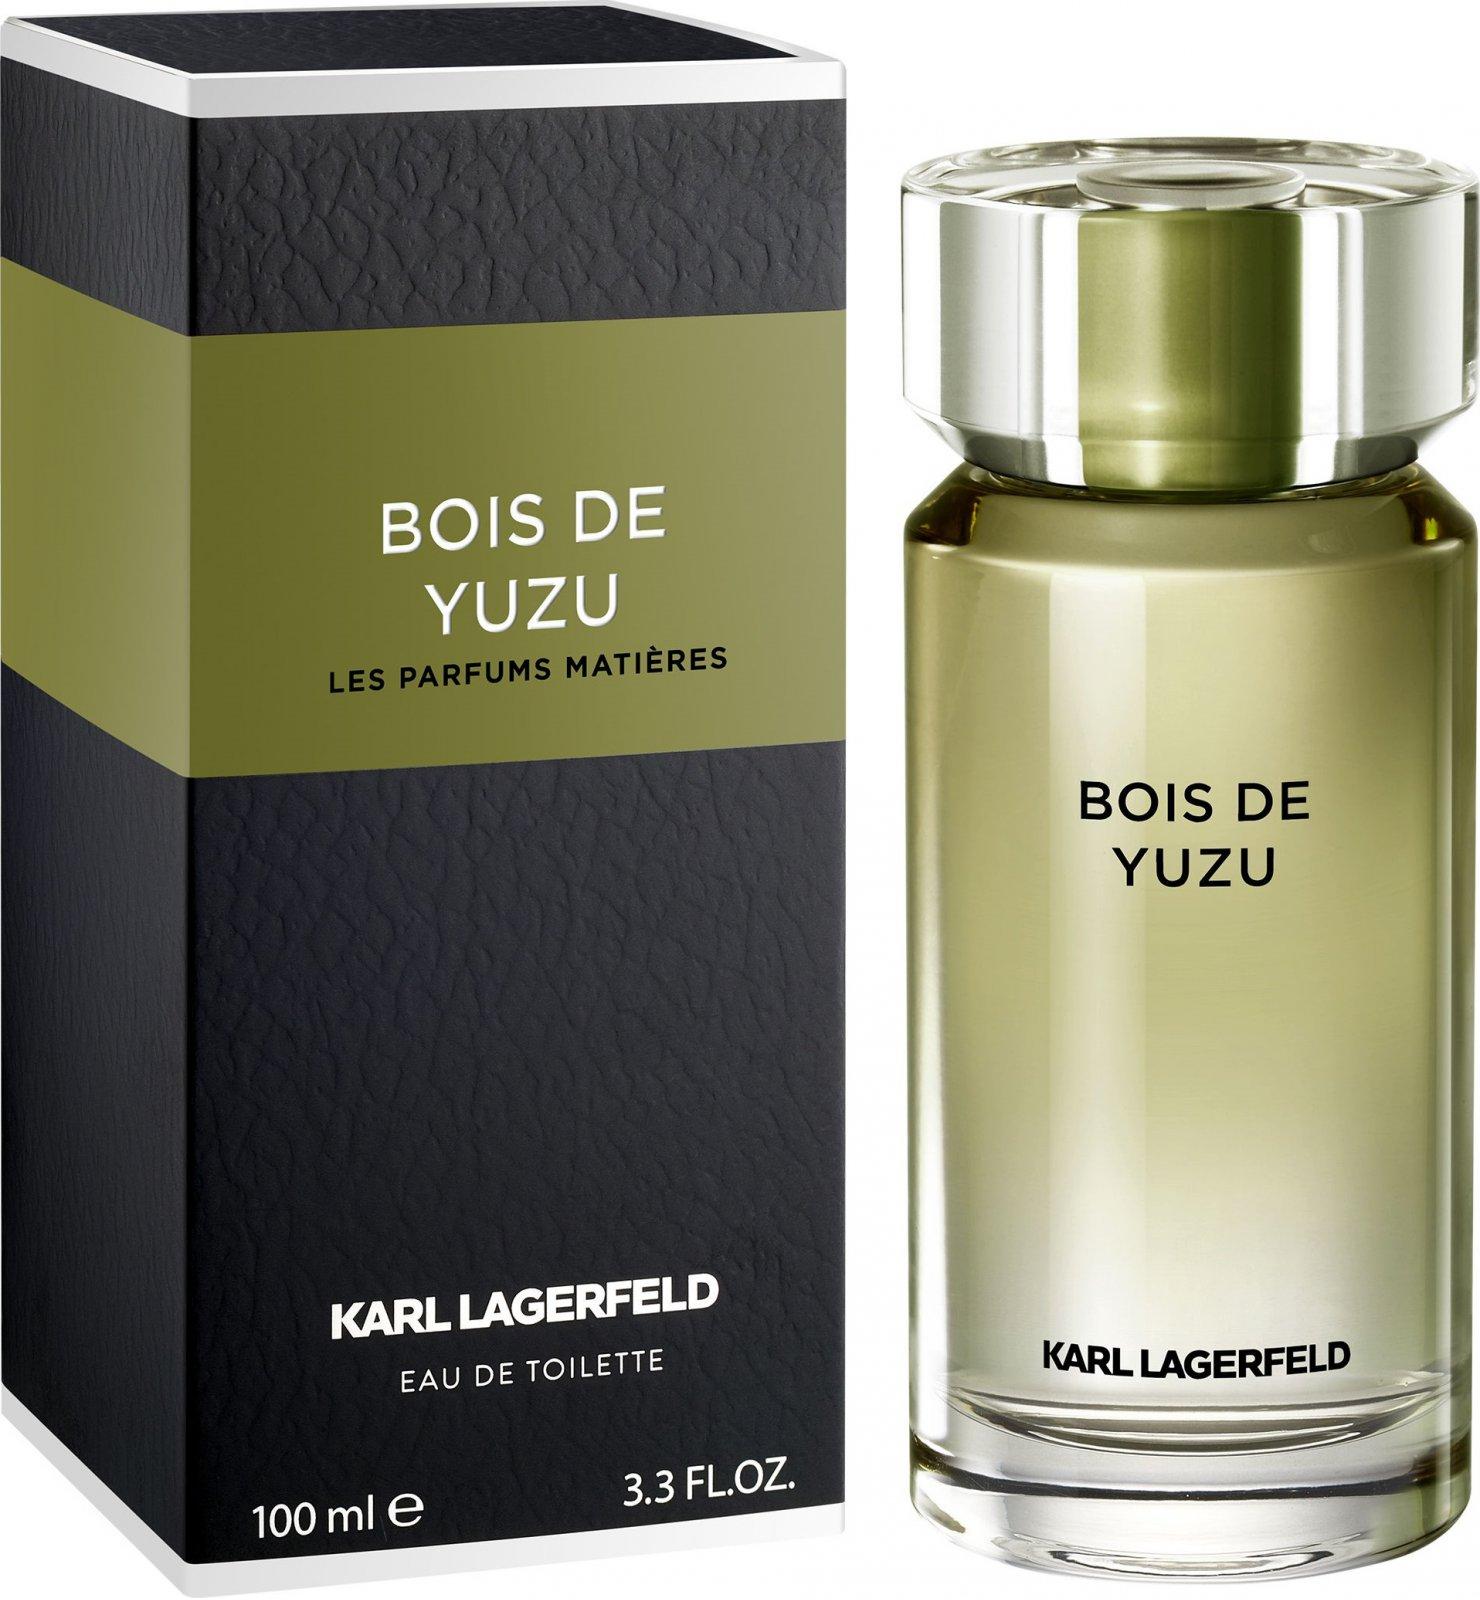 eba74c12ae1 Karl Lagerfeld Bois de Yuzu M EDT 100 ml od 494 Kč | Zboží.cz